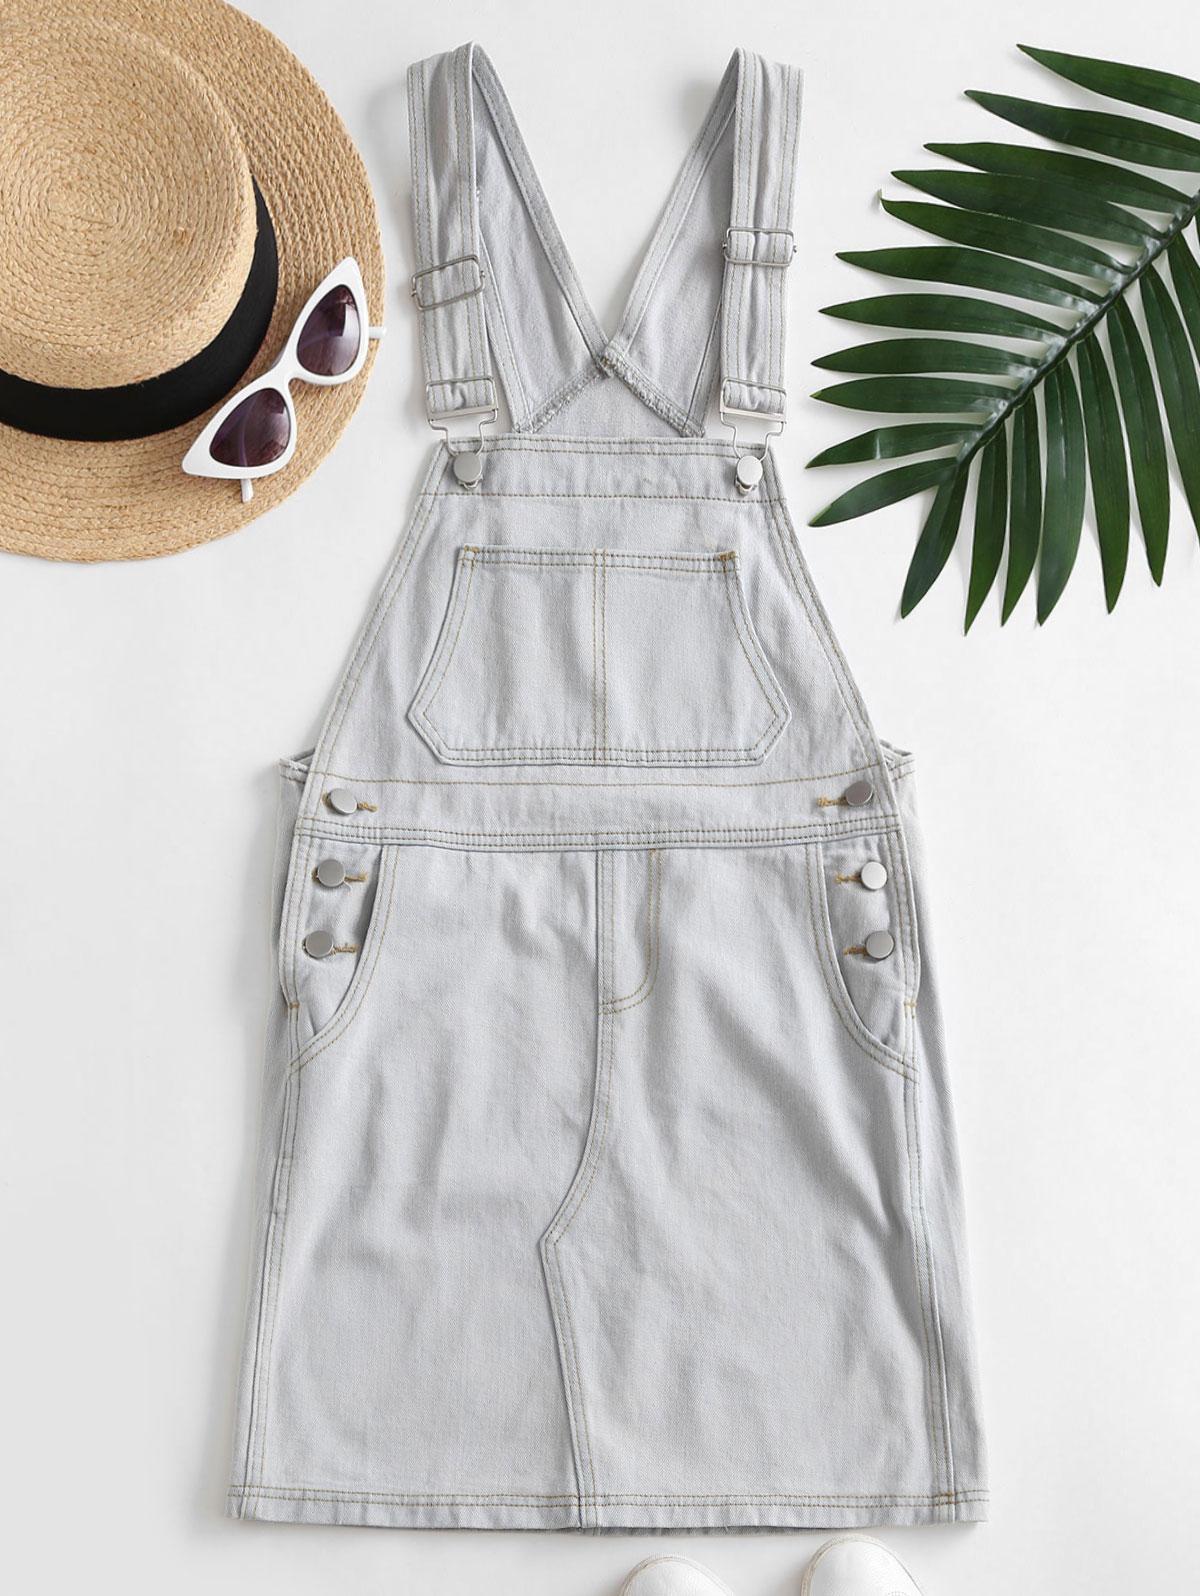 Casual Denim Pockets Overalls Dress